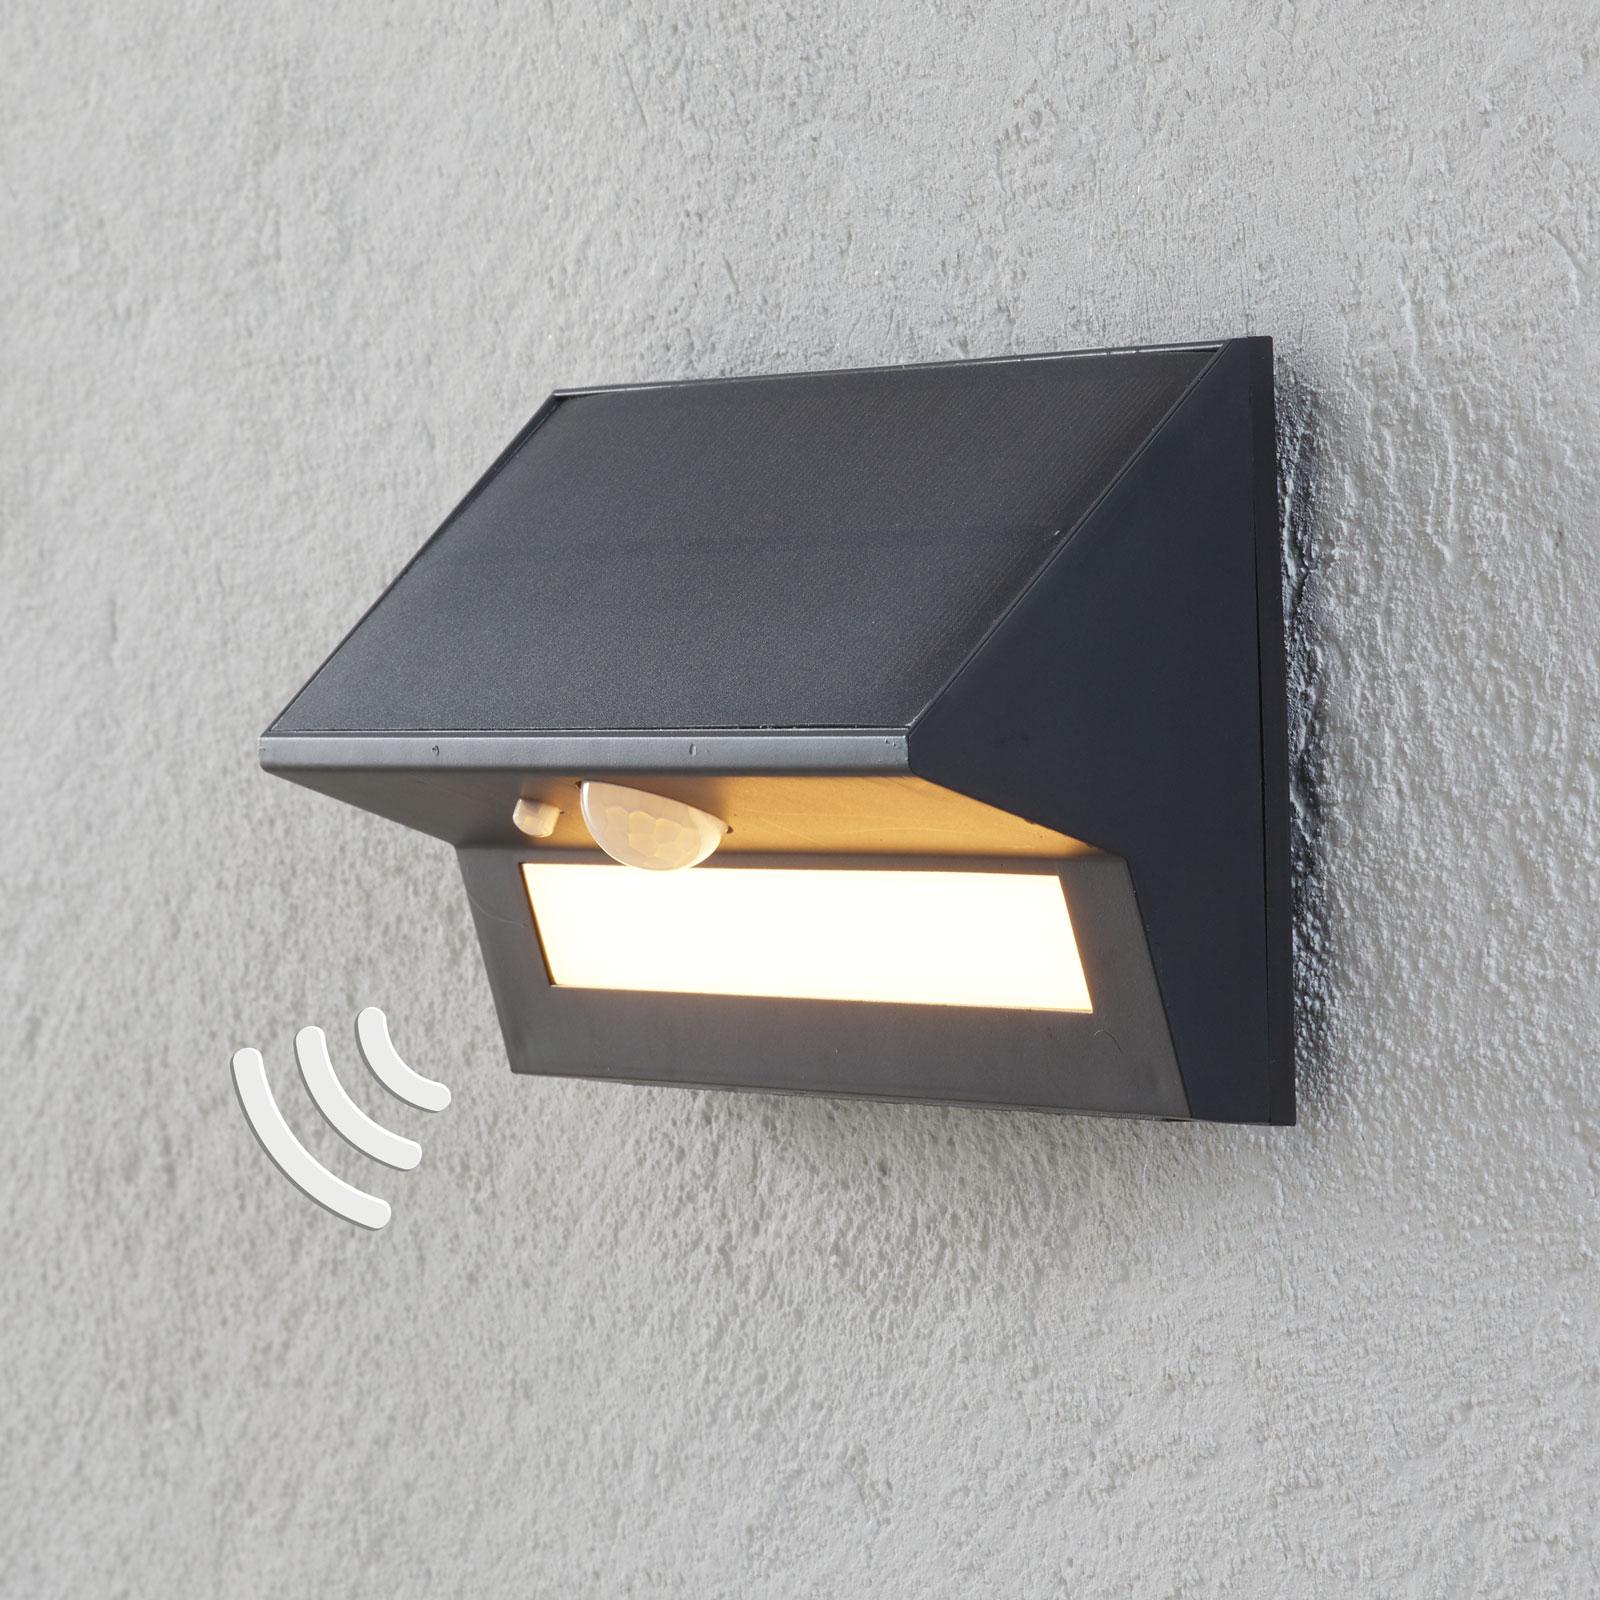 LED-Solar-Außenwandlampe Kristiana mit Sensor